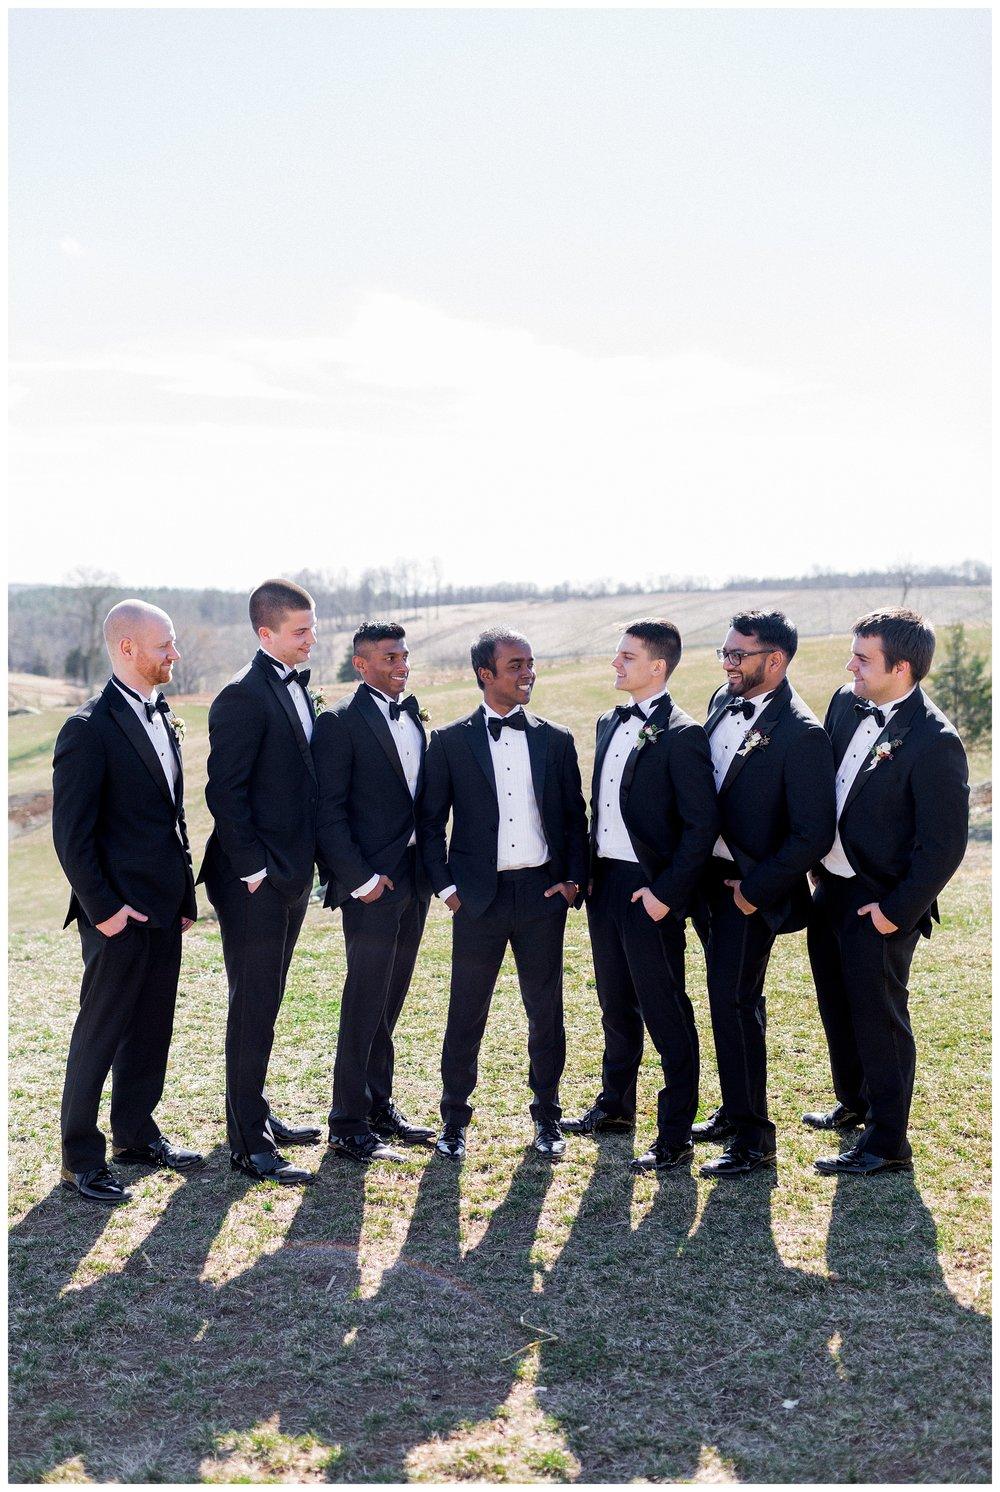 Stone Tower Winery Wedding | Virginia Winter Wedding | VA Wedding Photographer Kir Tuben_0065.jpg